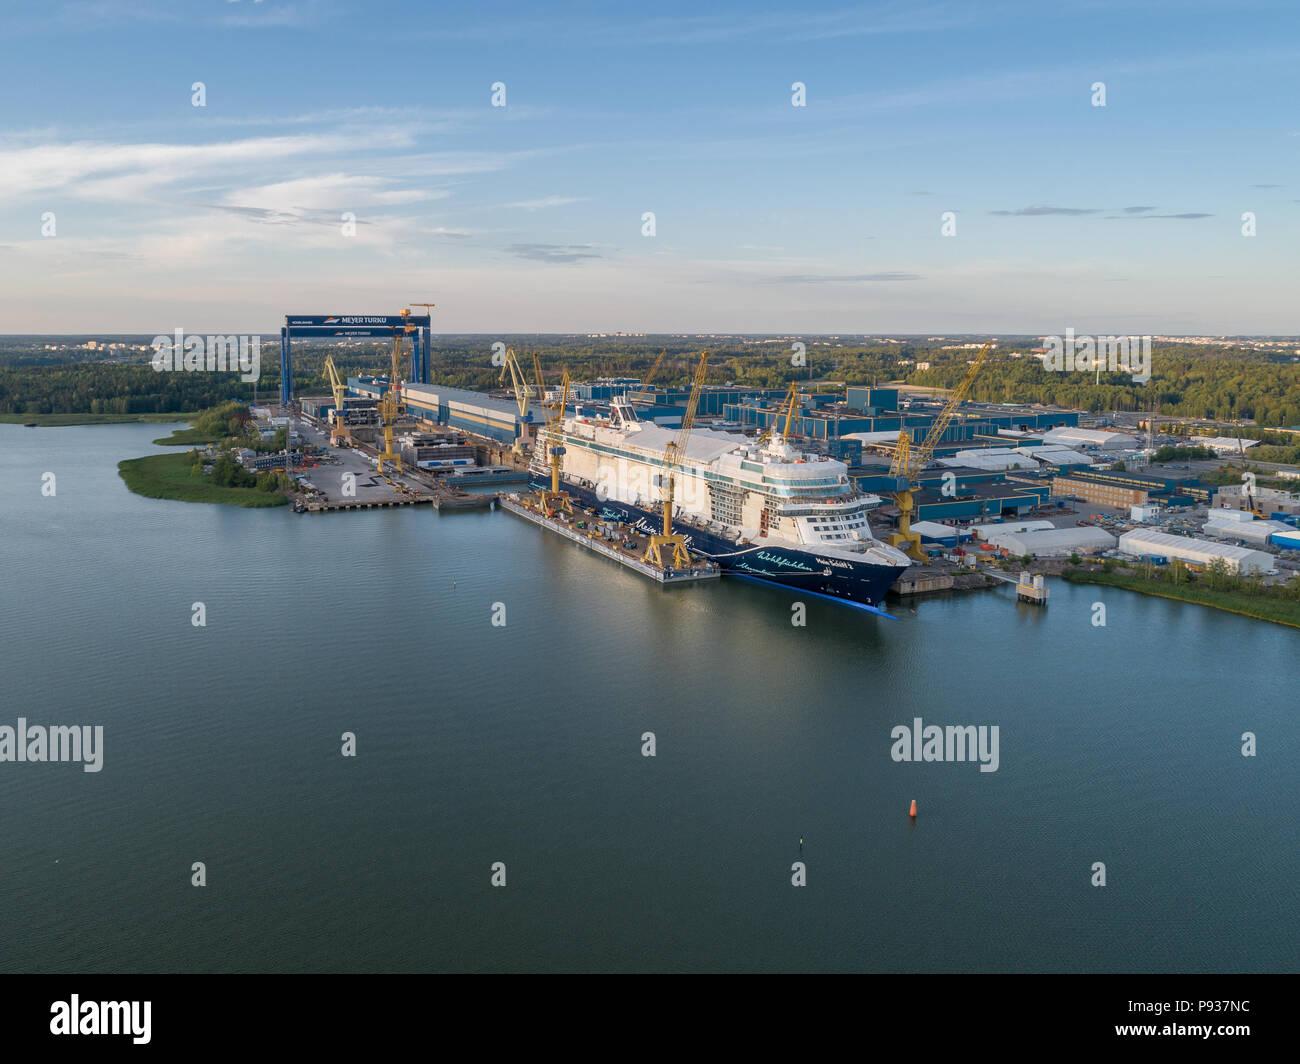 TURKU, FINLAND - 6/7/2018: Aerial view of Meyer Turku shipyard with Mein Schiff cruise ship under construction - Stock Image